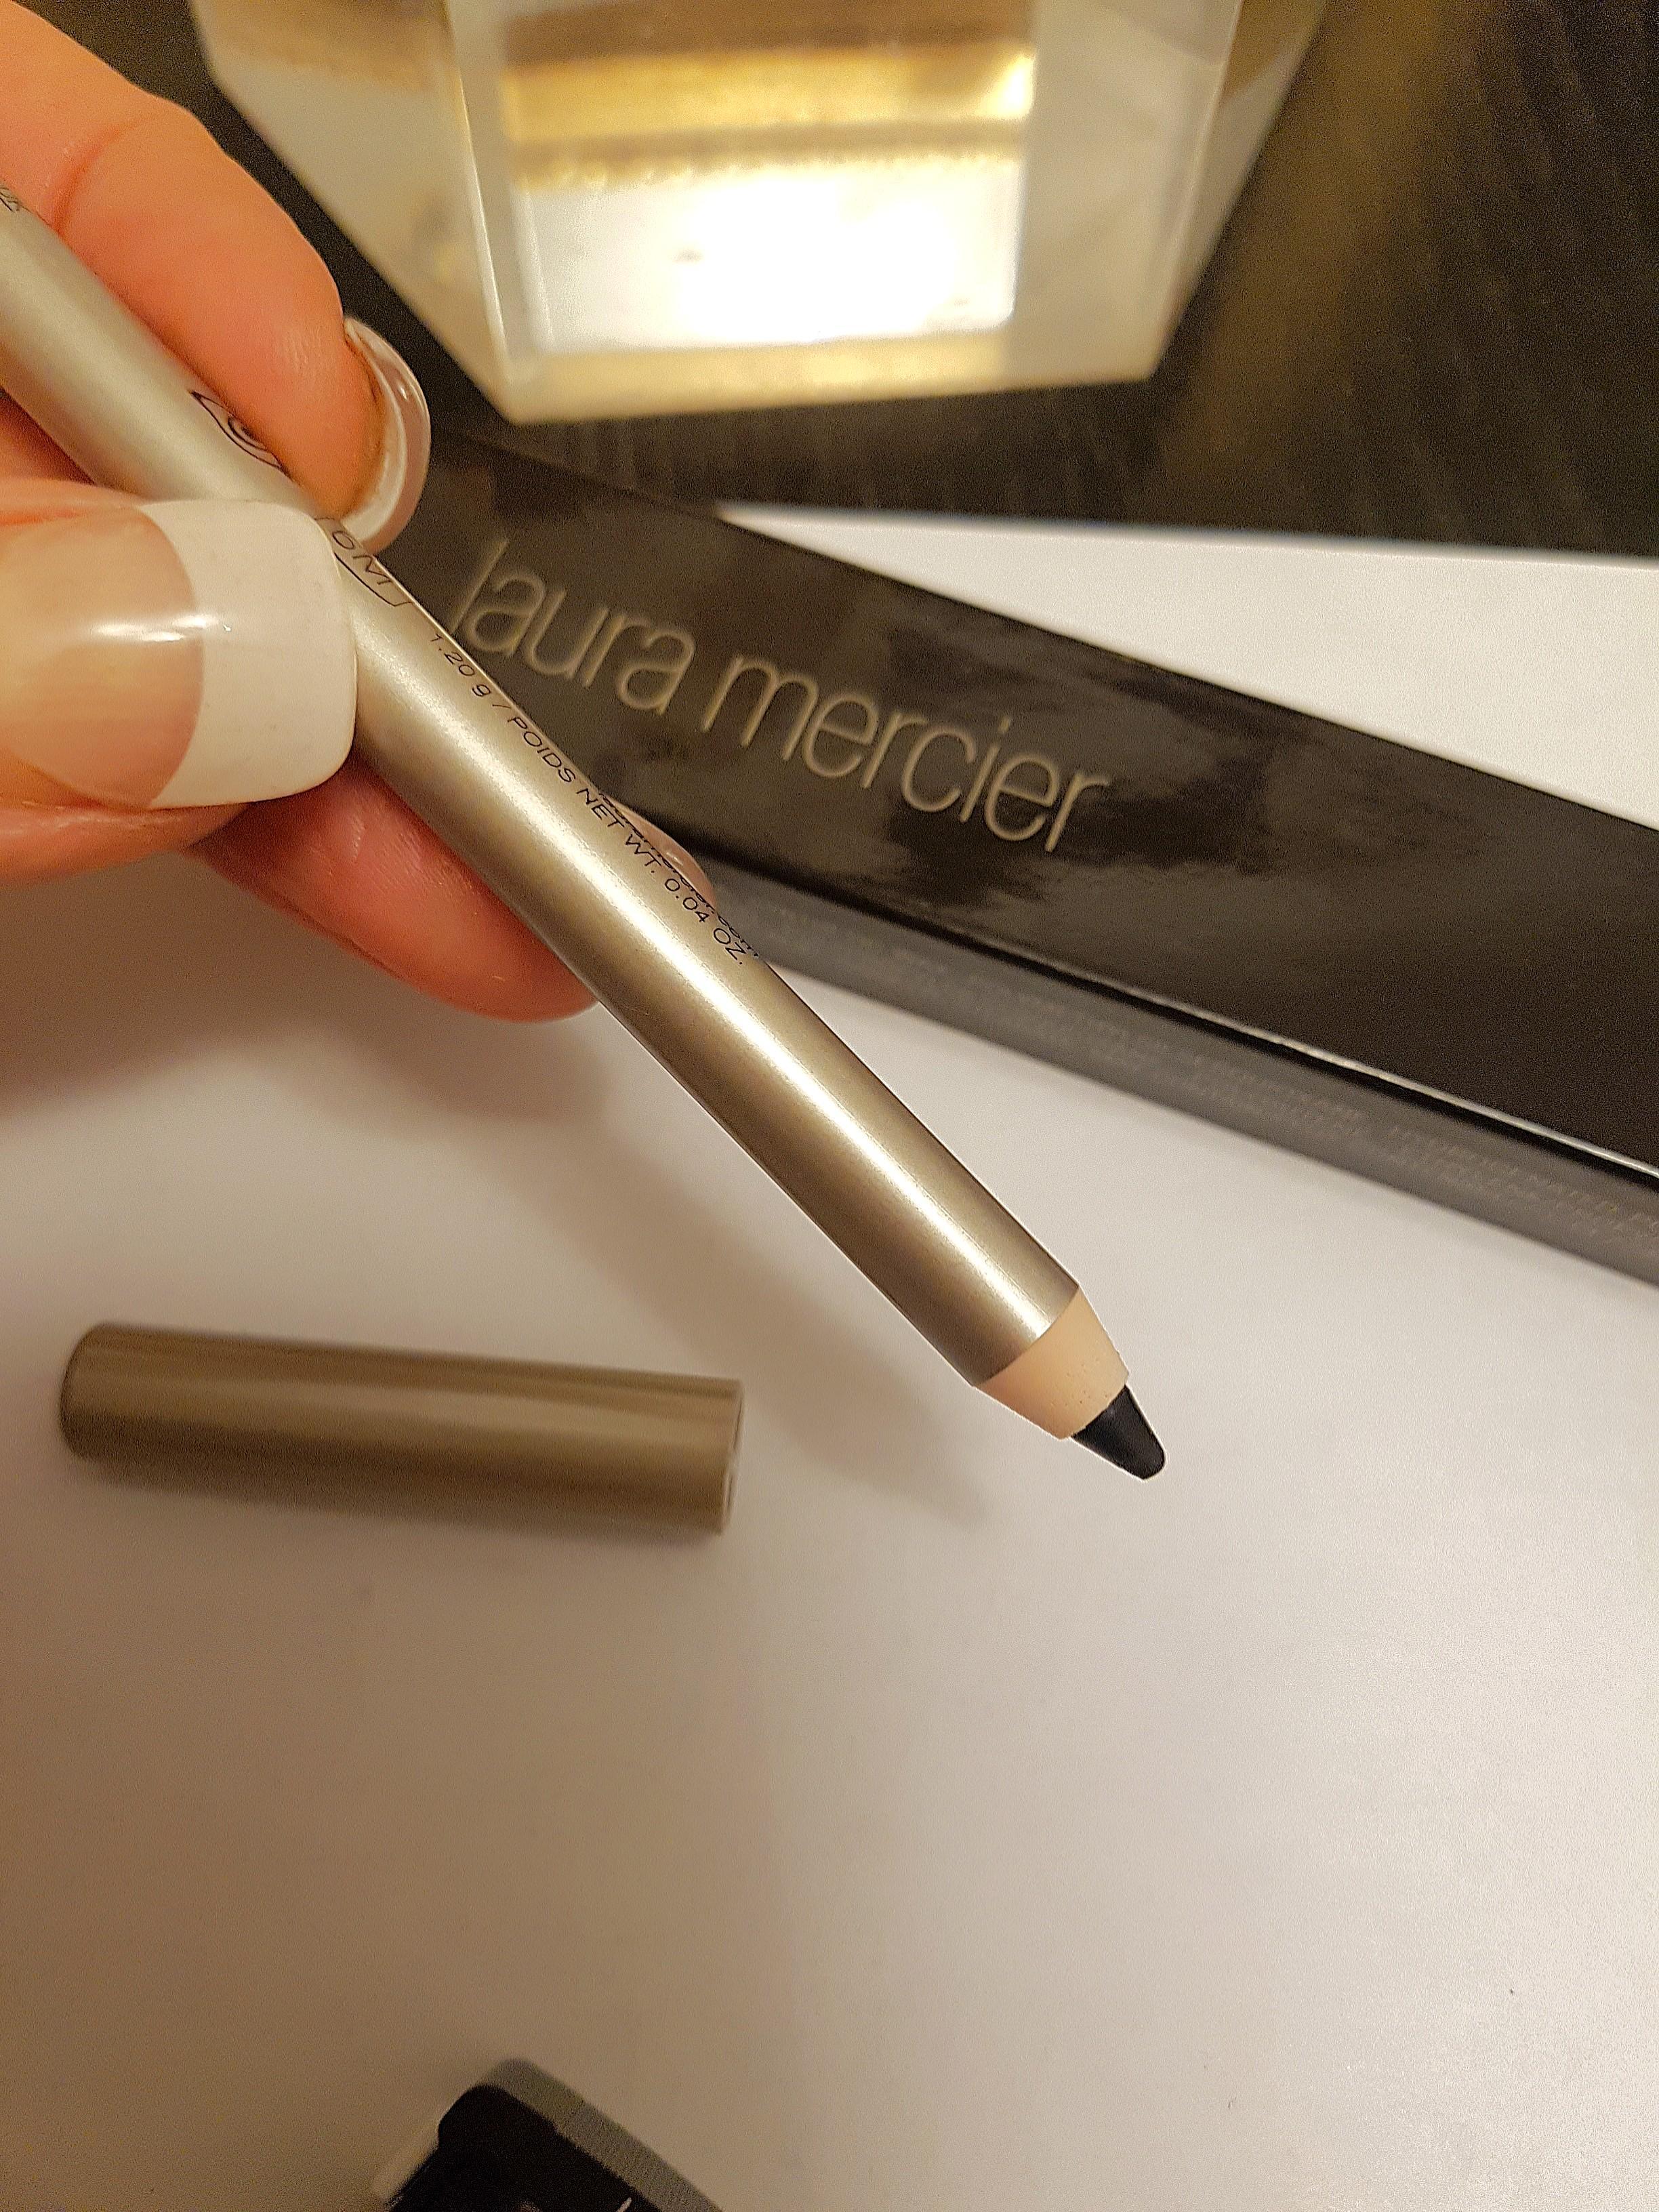 Laura Mercier Longwear creme eye pencil in Espresso